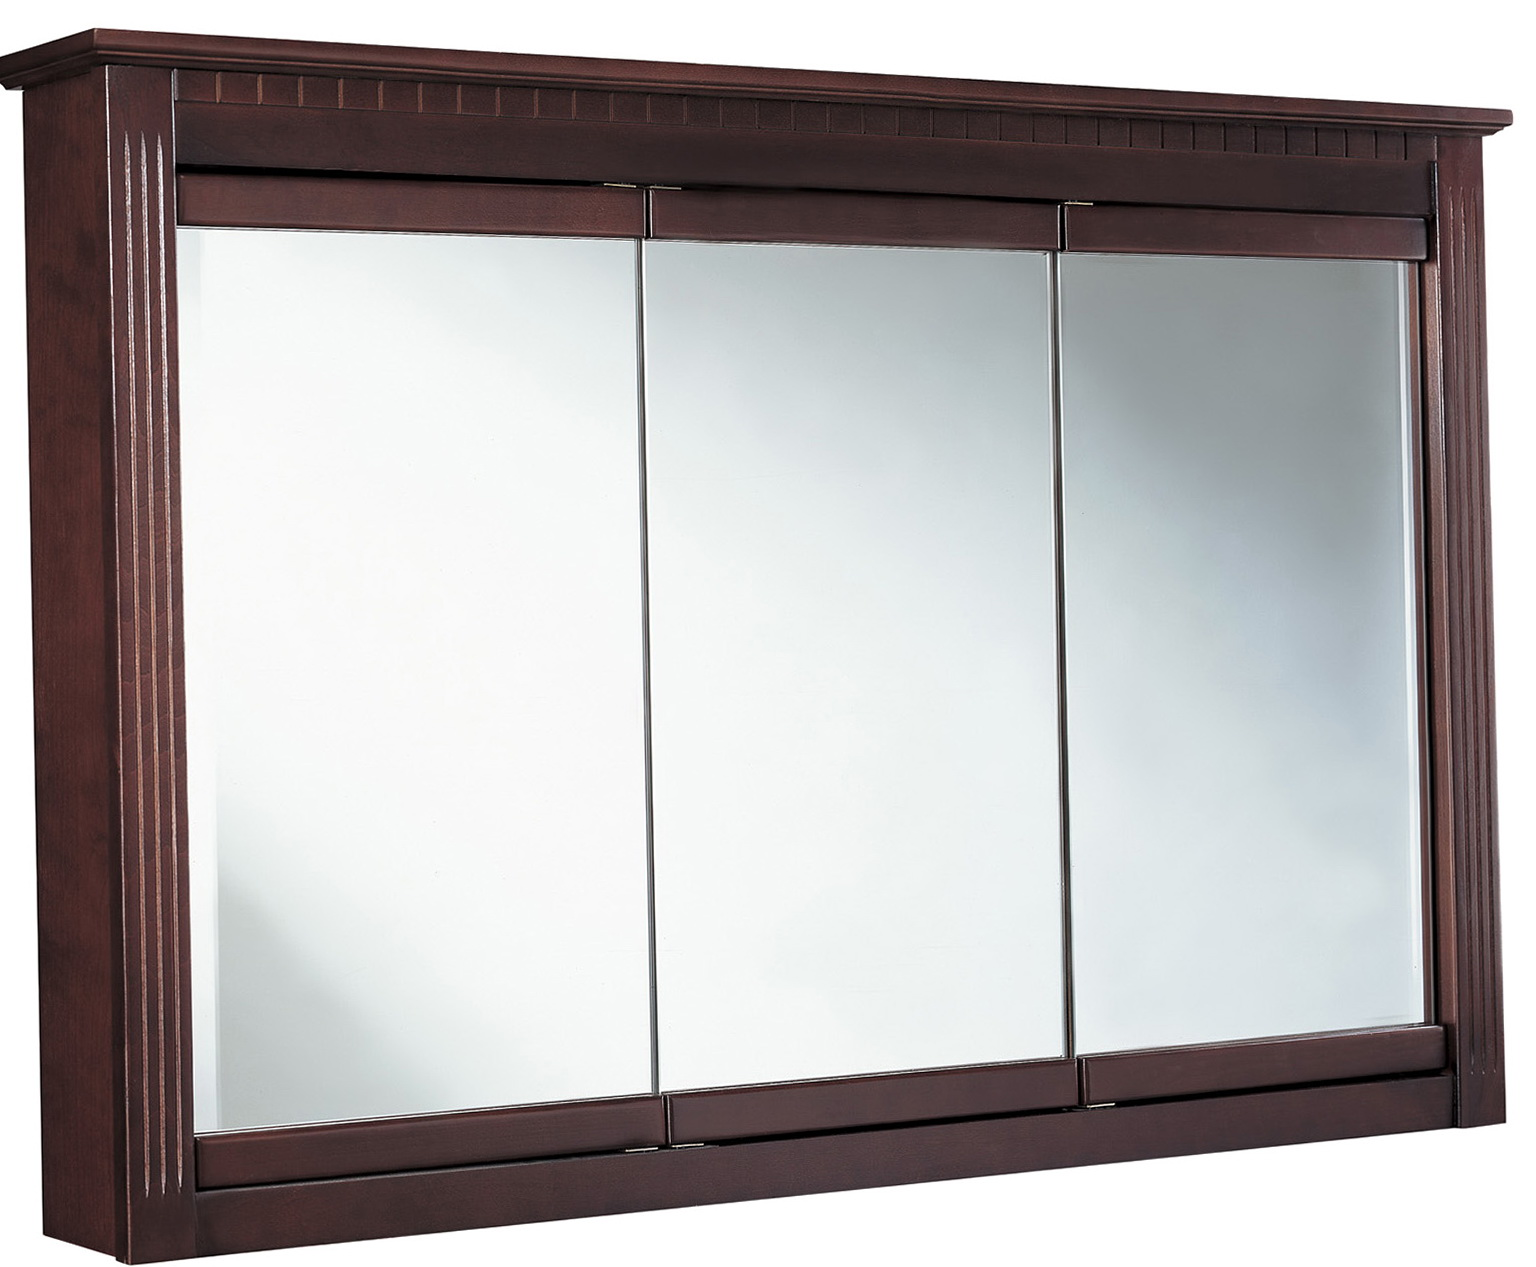 Espresso Medicine Cabinet Surface Mount